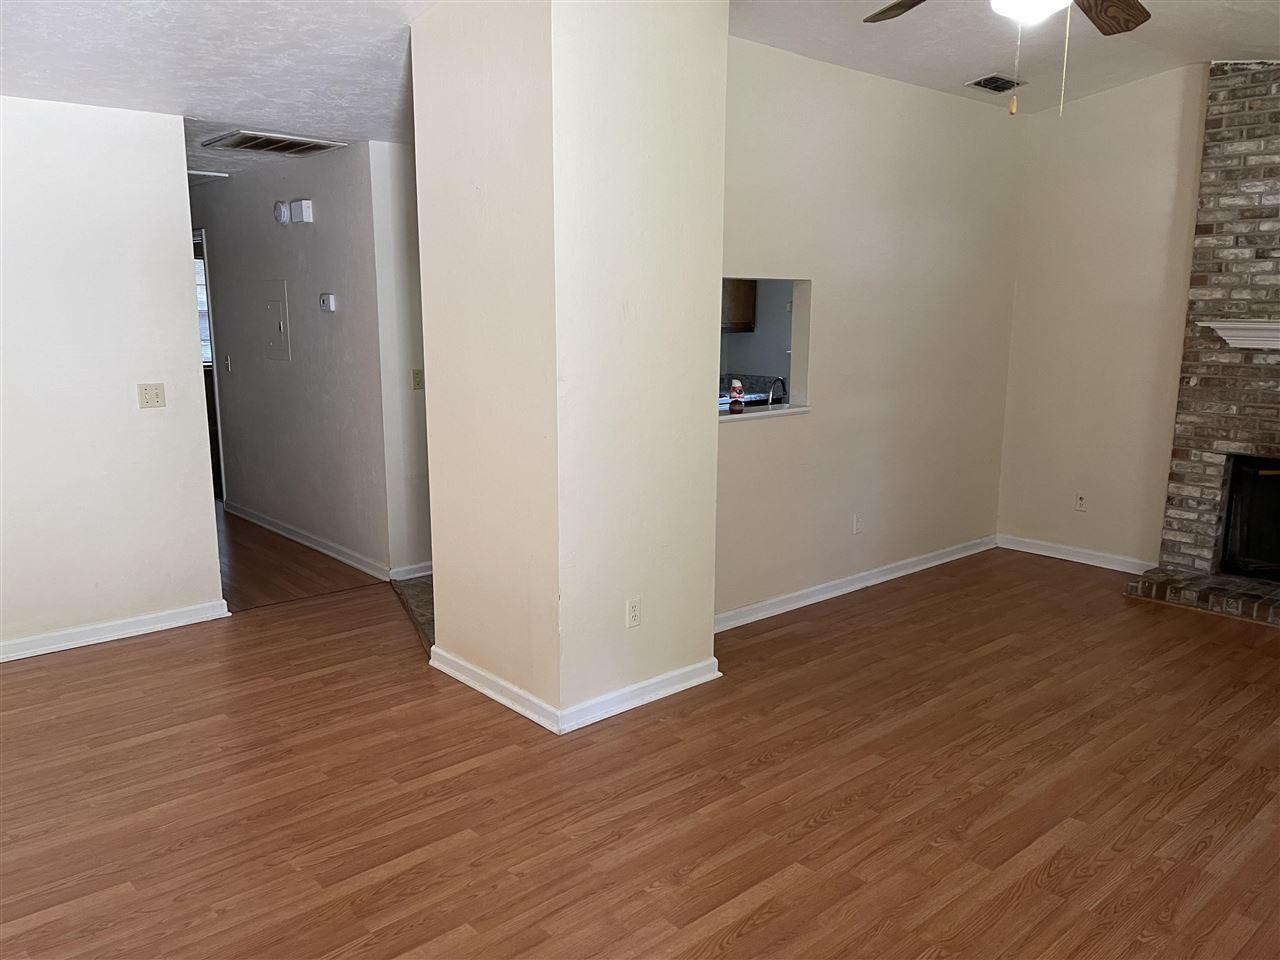 Photo of 2236 CLAREMONT Lane, TALLAHASSEE, FL 32301 (MLS # 334978)